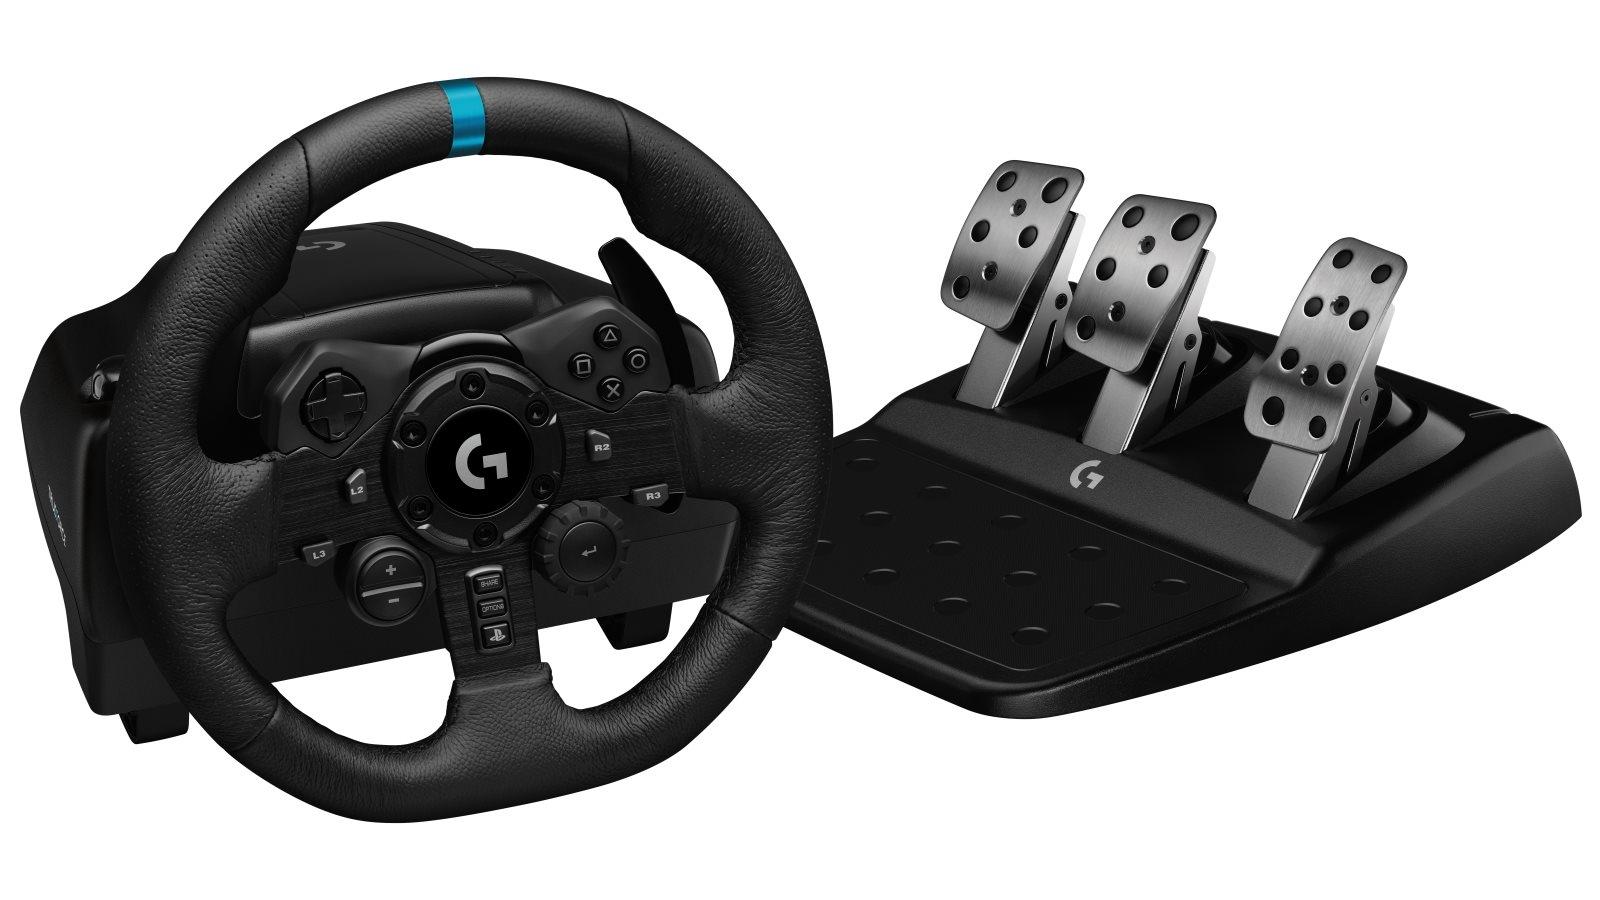 Image of Logitech G923 TRUEFORCE Sim Racing Wheel for PlayStation & PC